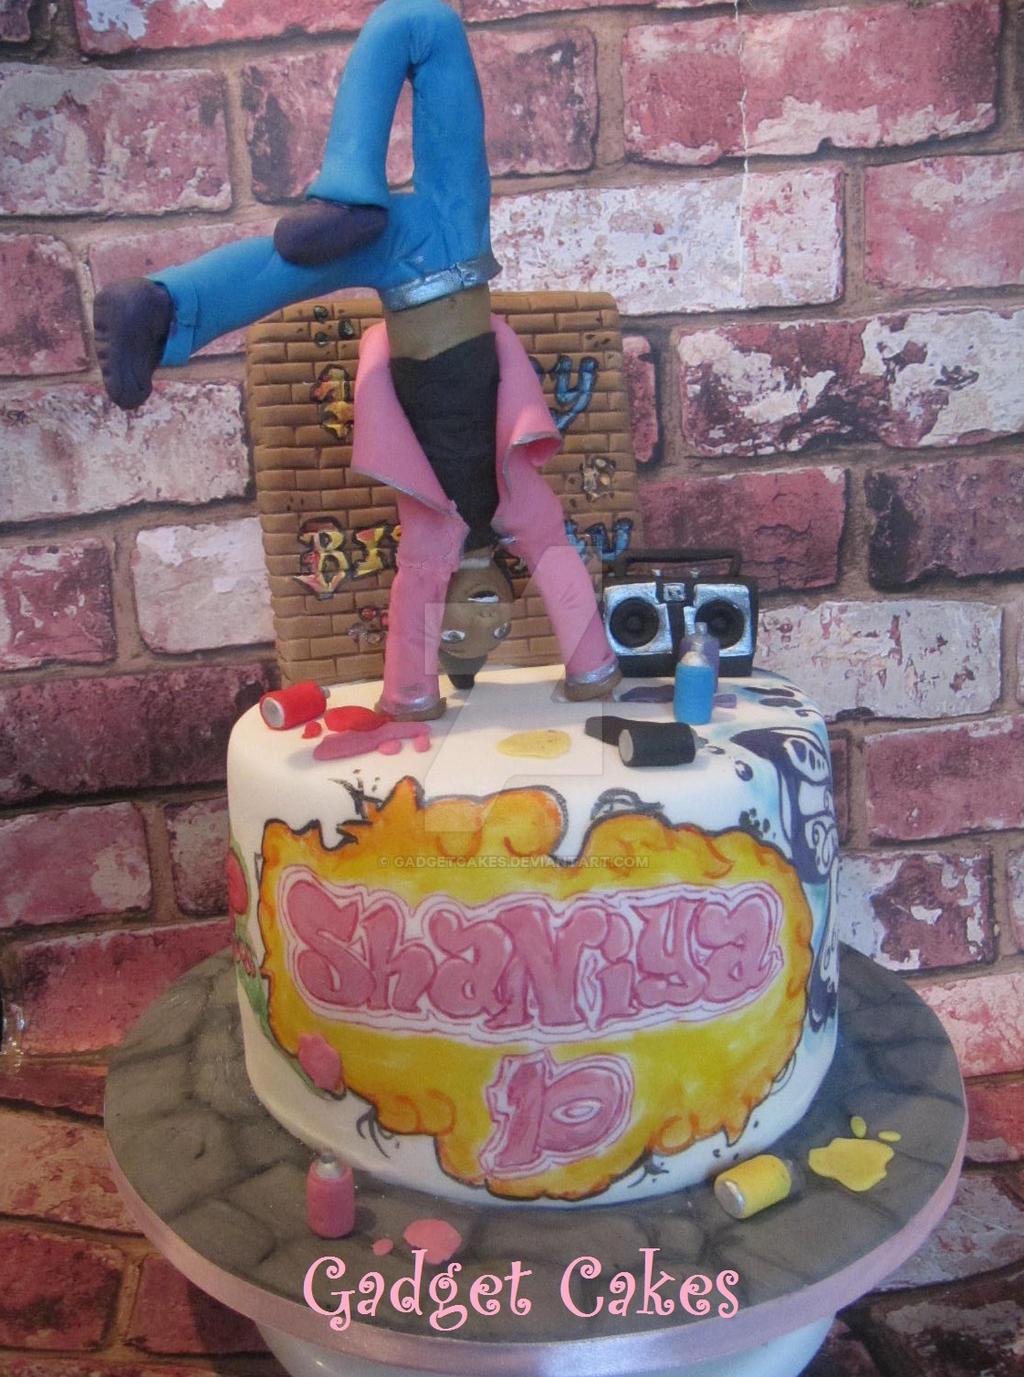 Cake Street Artist : Street Dance / Graffiti Cake by gadgetcakes on DeviantArt